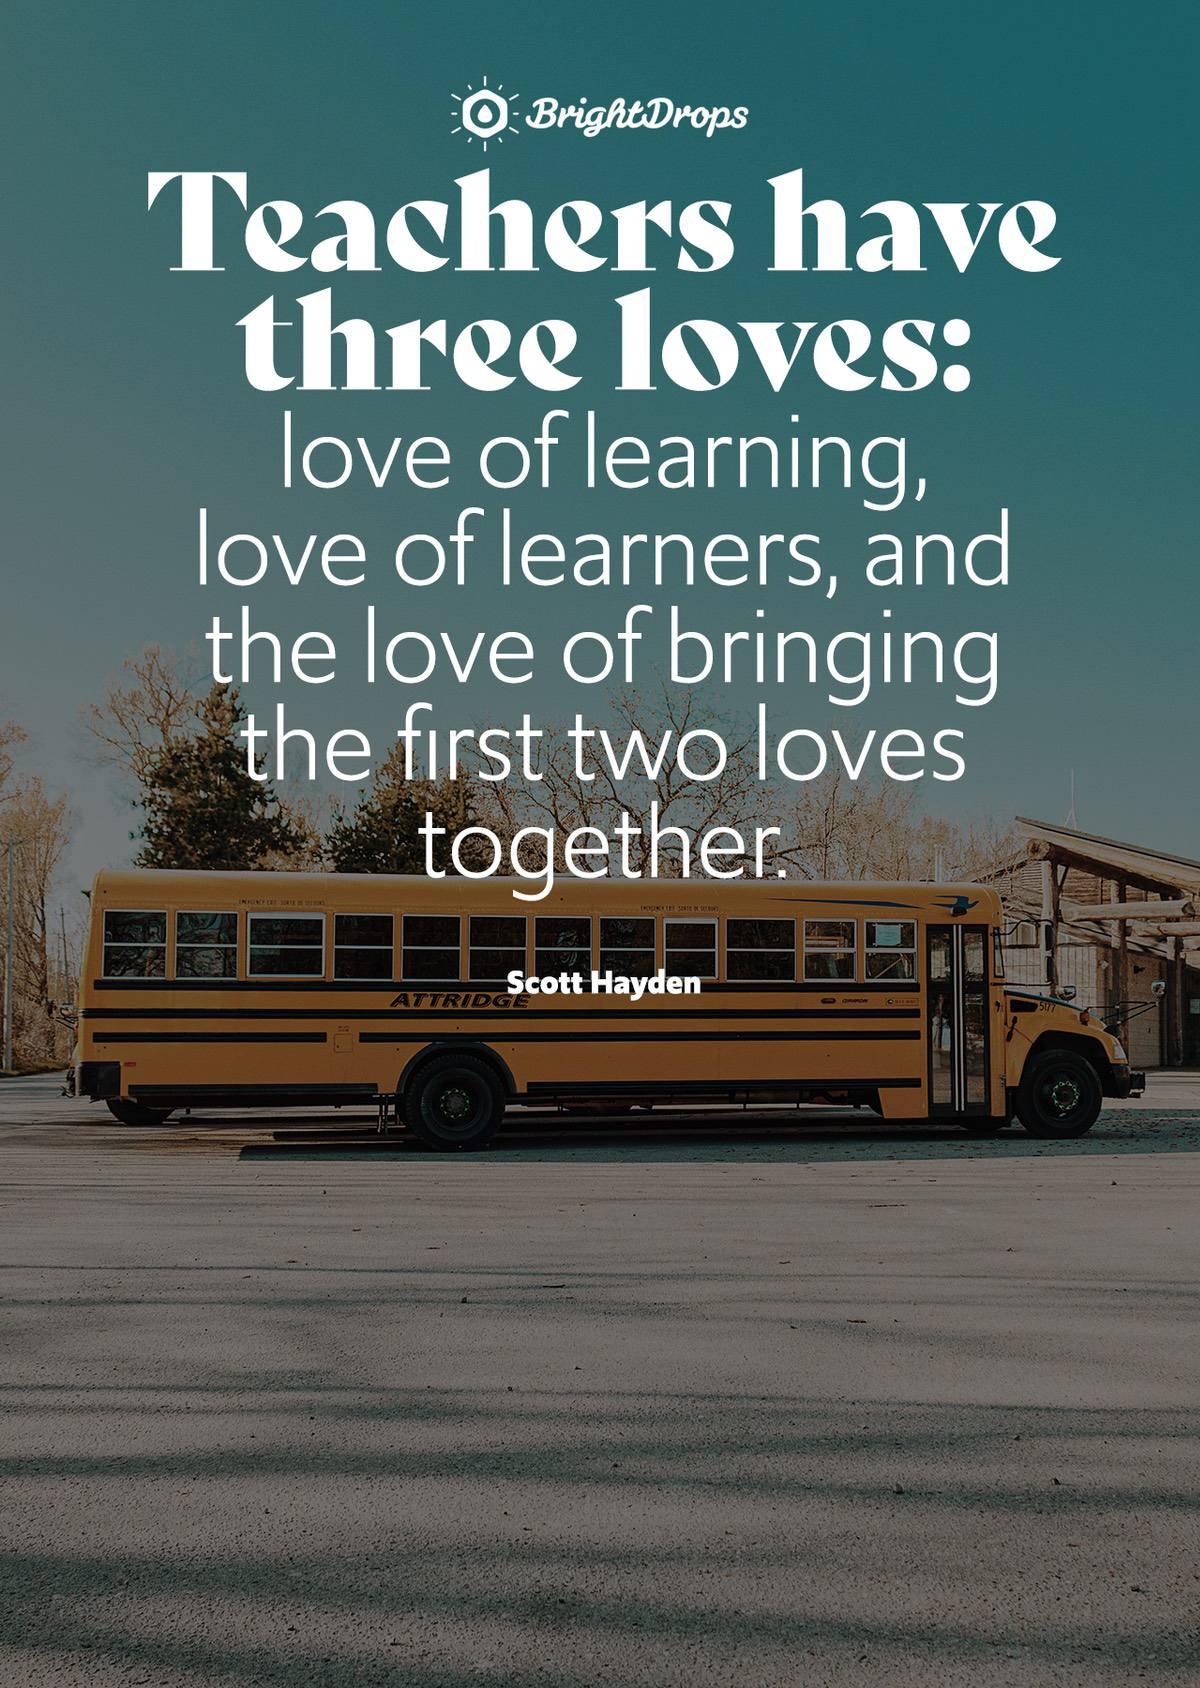 Teachers have three loves: love of learning, love of learners, and the love of bringing the first two loves together. - Scott Hayden